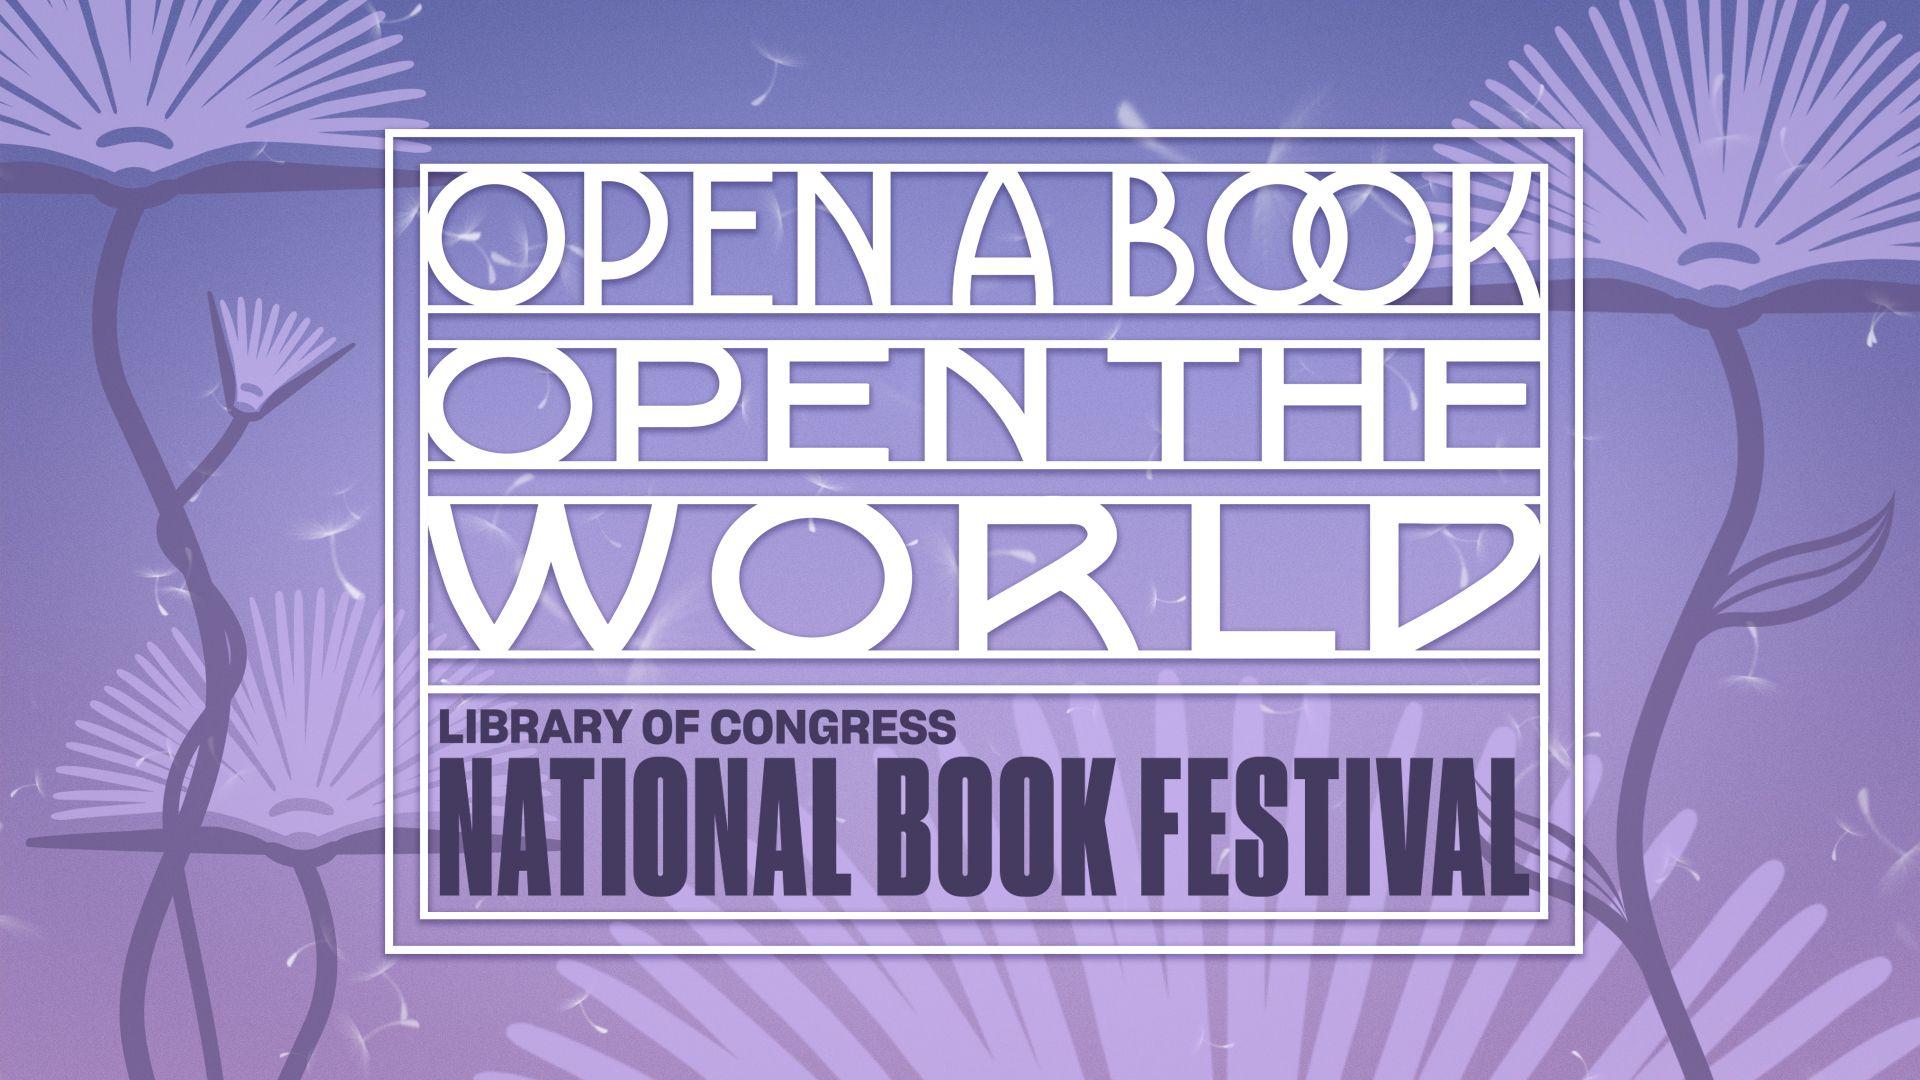 open a book, open the world - National Book Festival